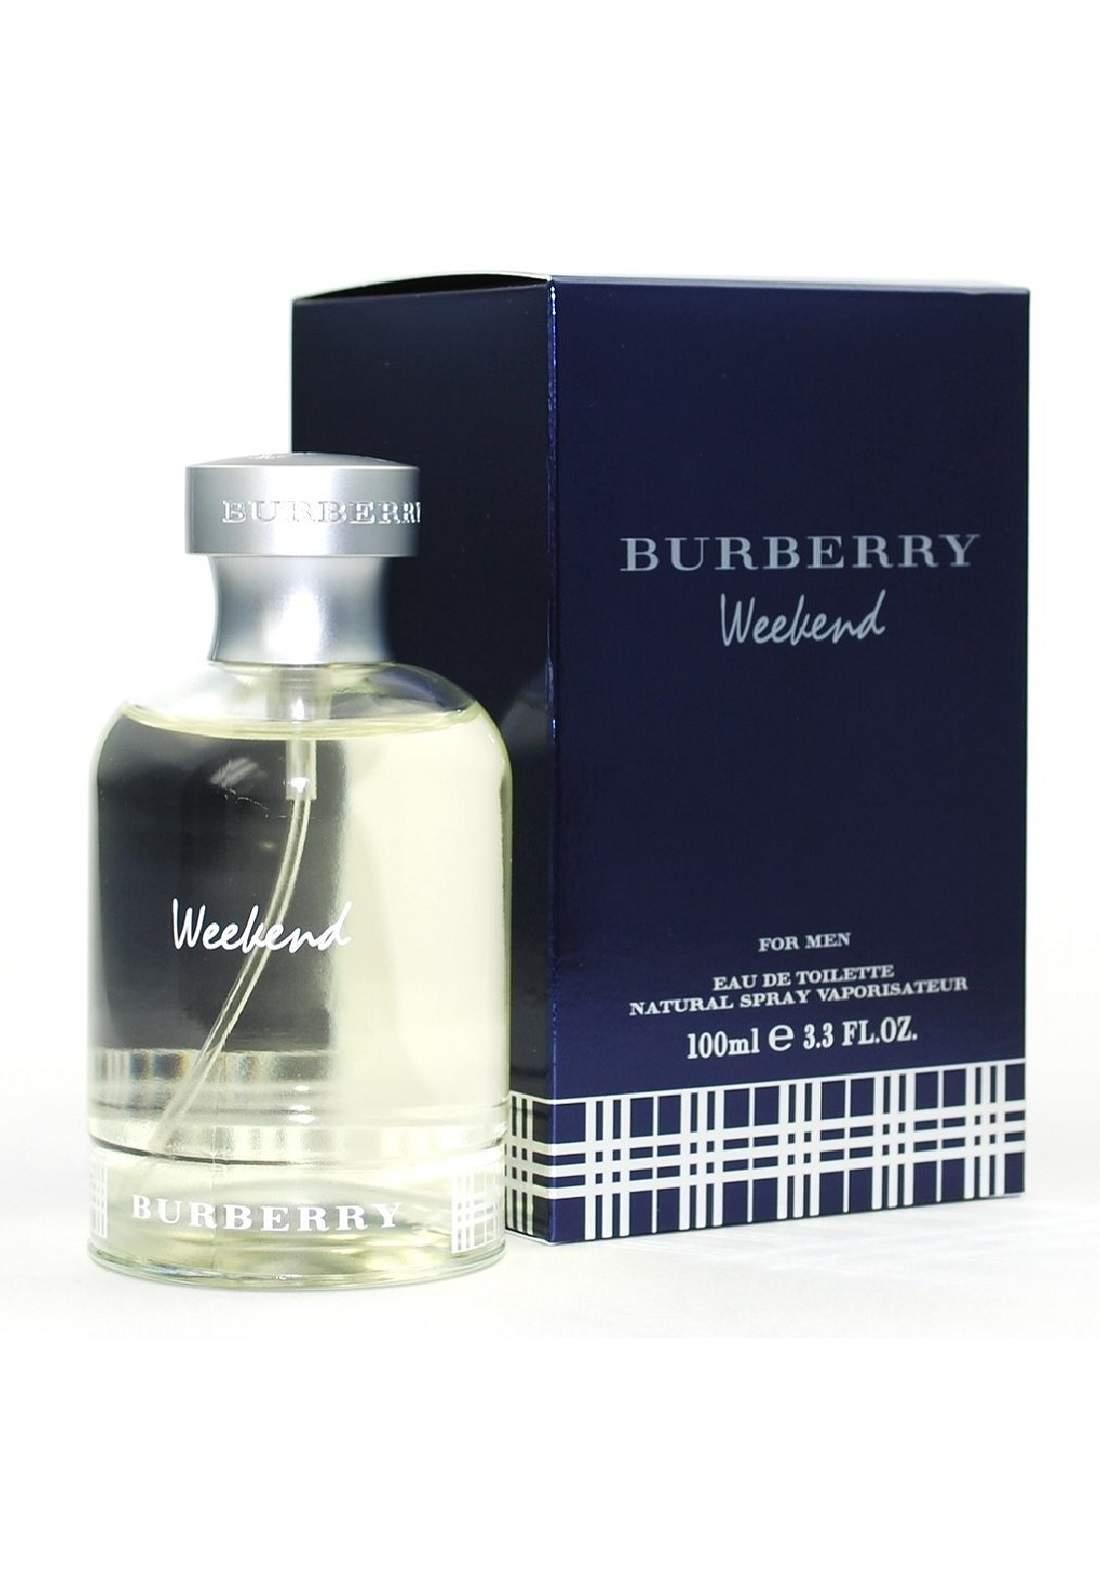 Burberry Weekend For Men edt 100 ml عطر رجالي